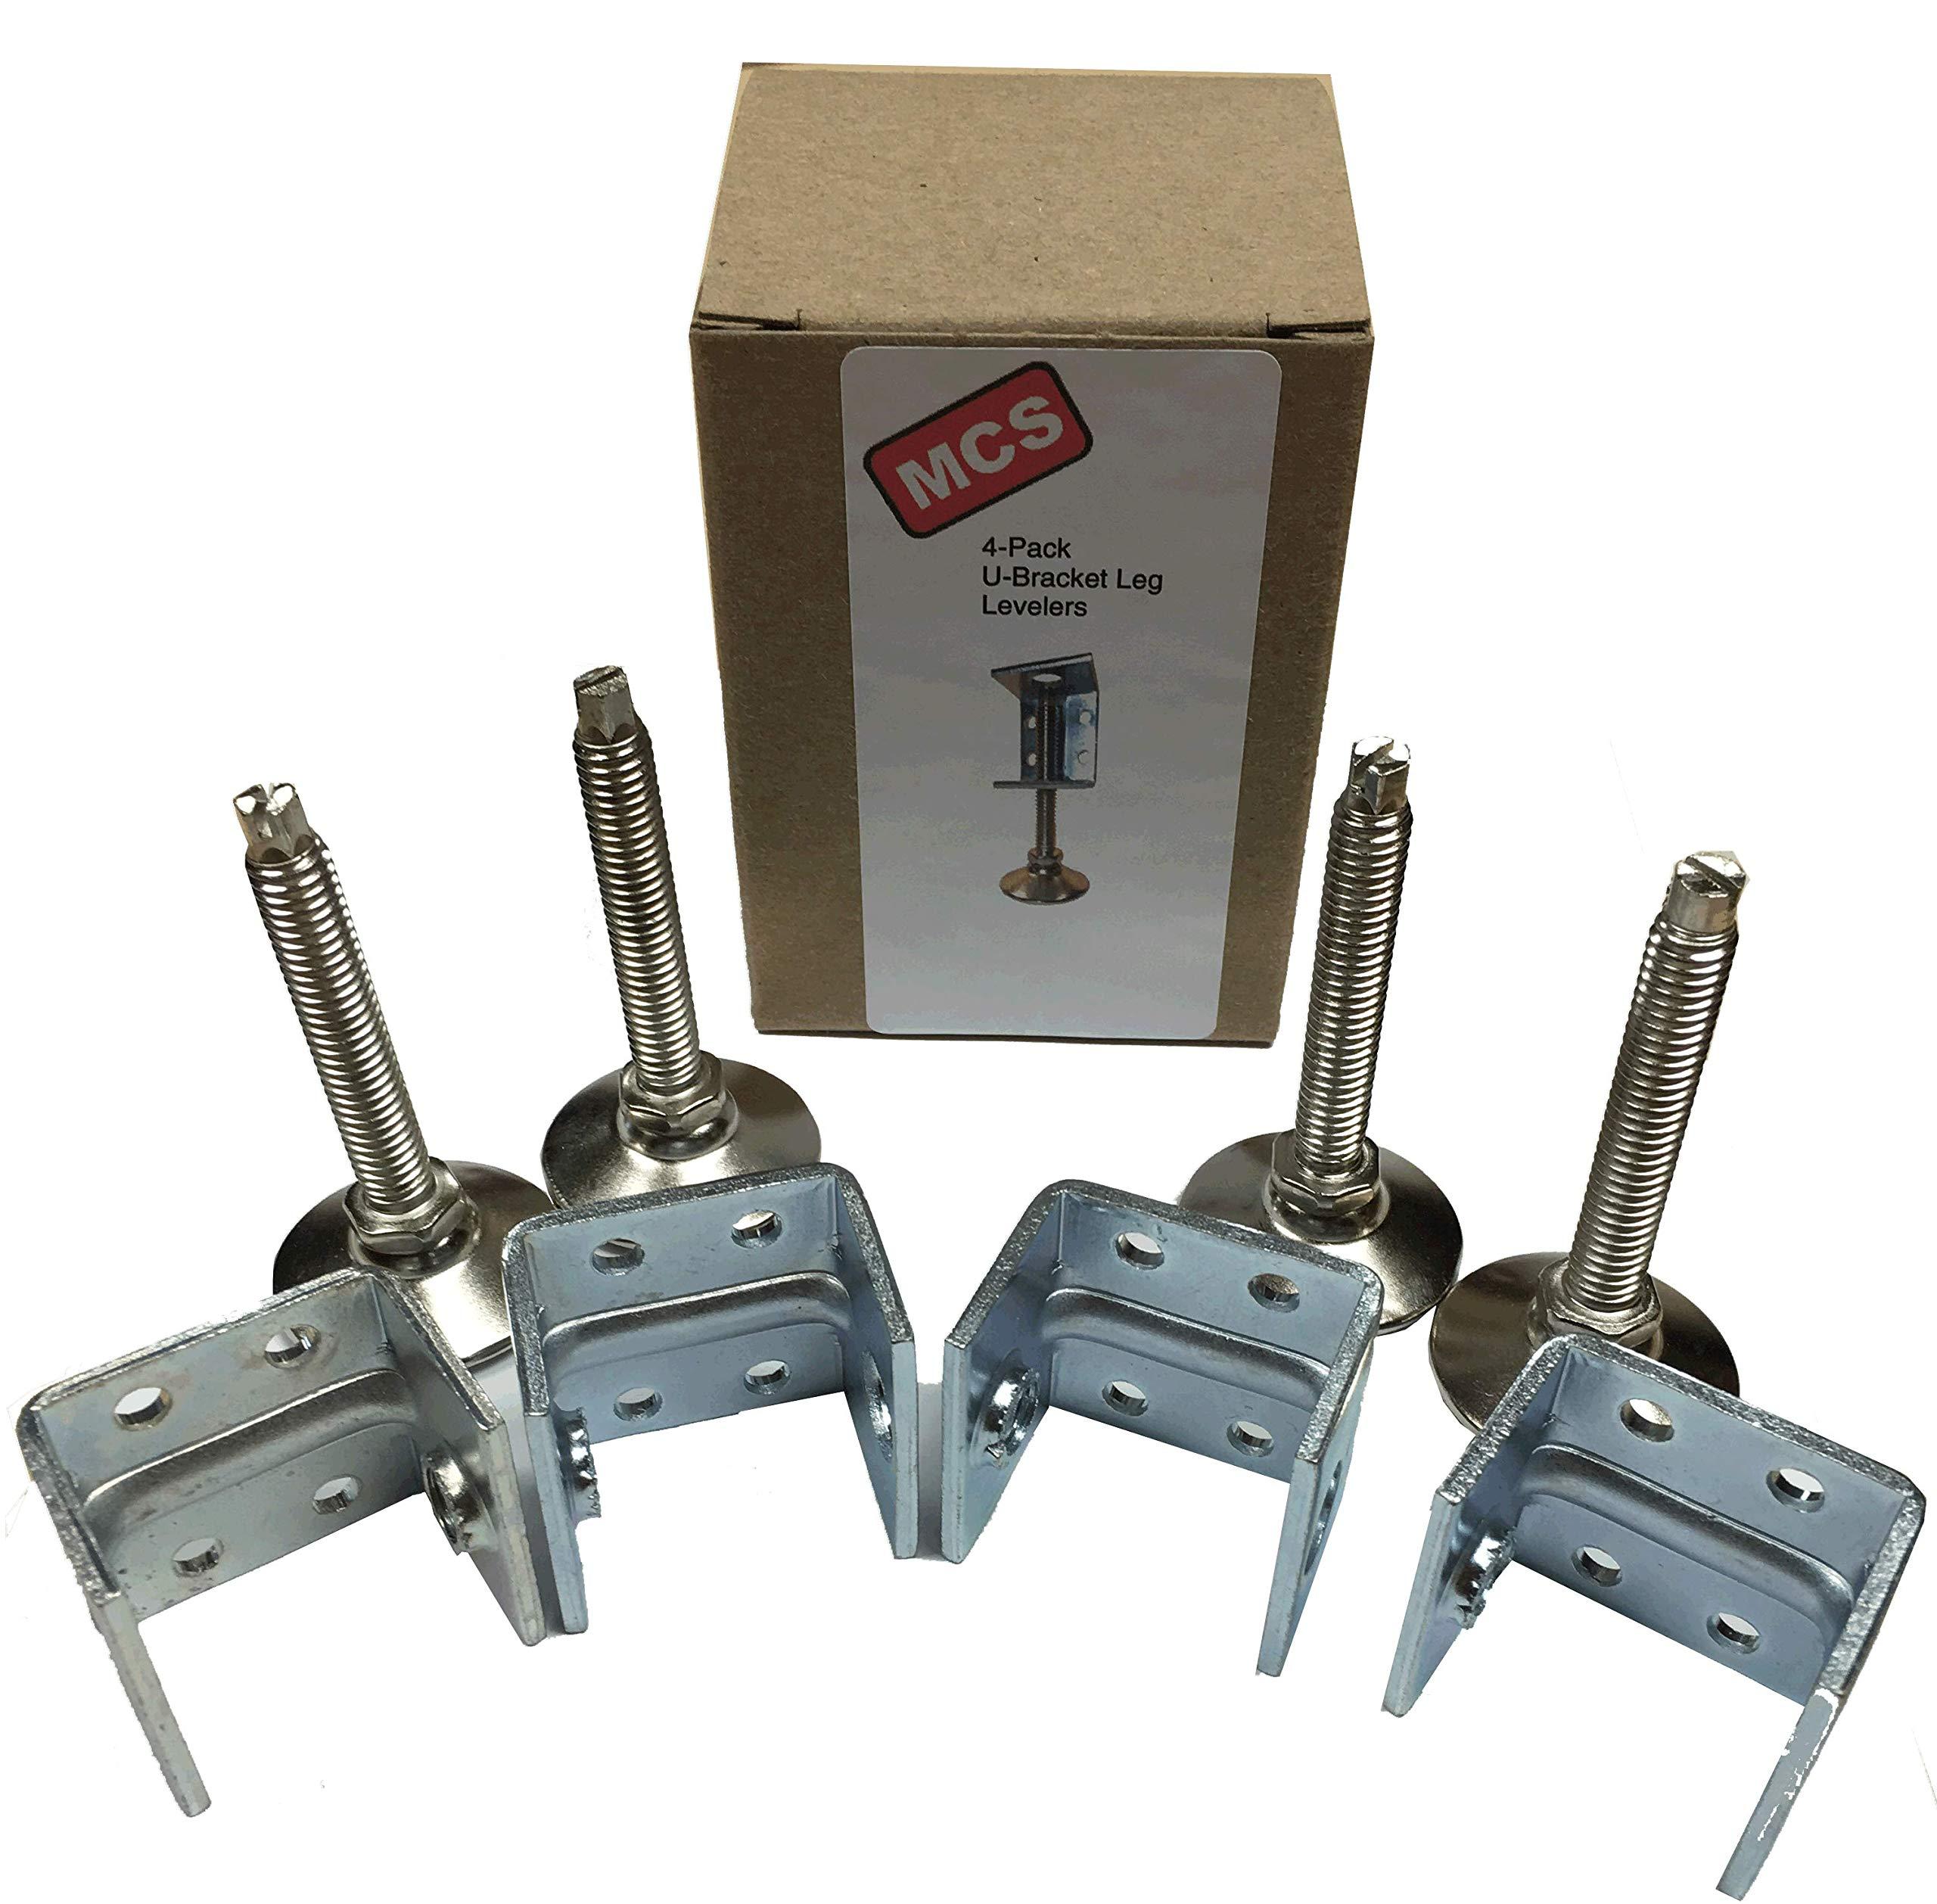 Adjustable Leveler with U-bracket (Set of 4)